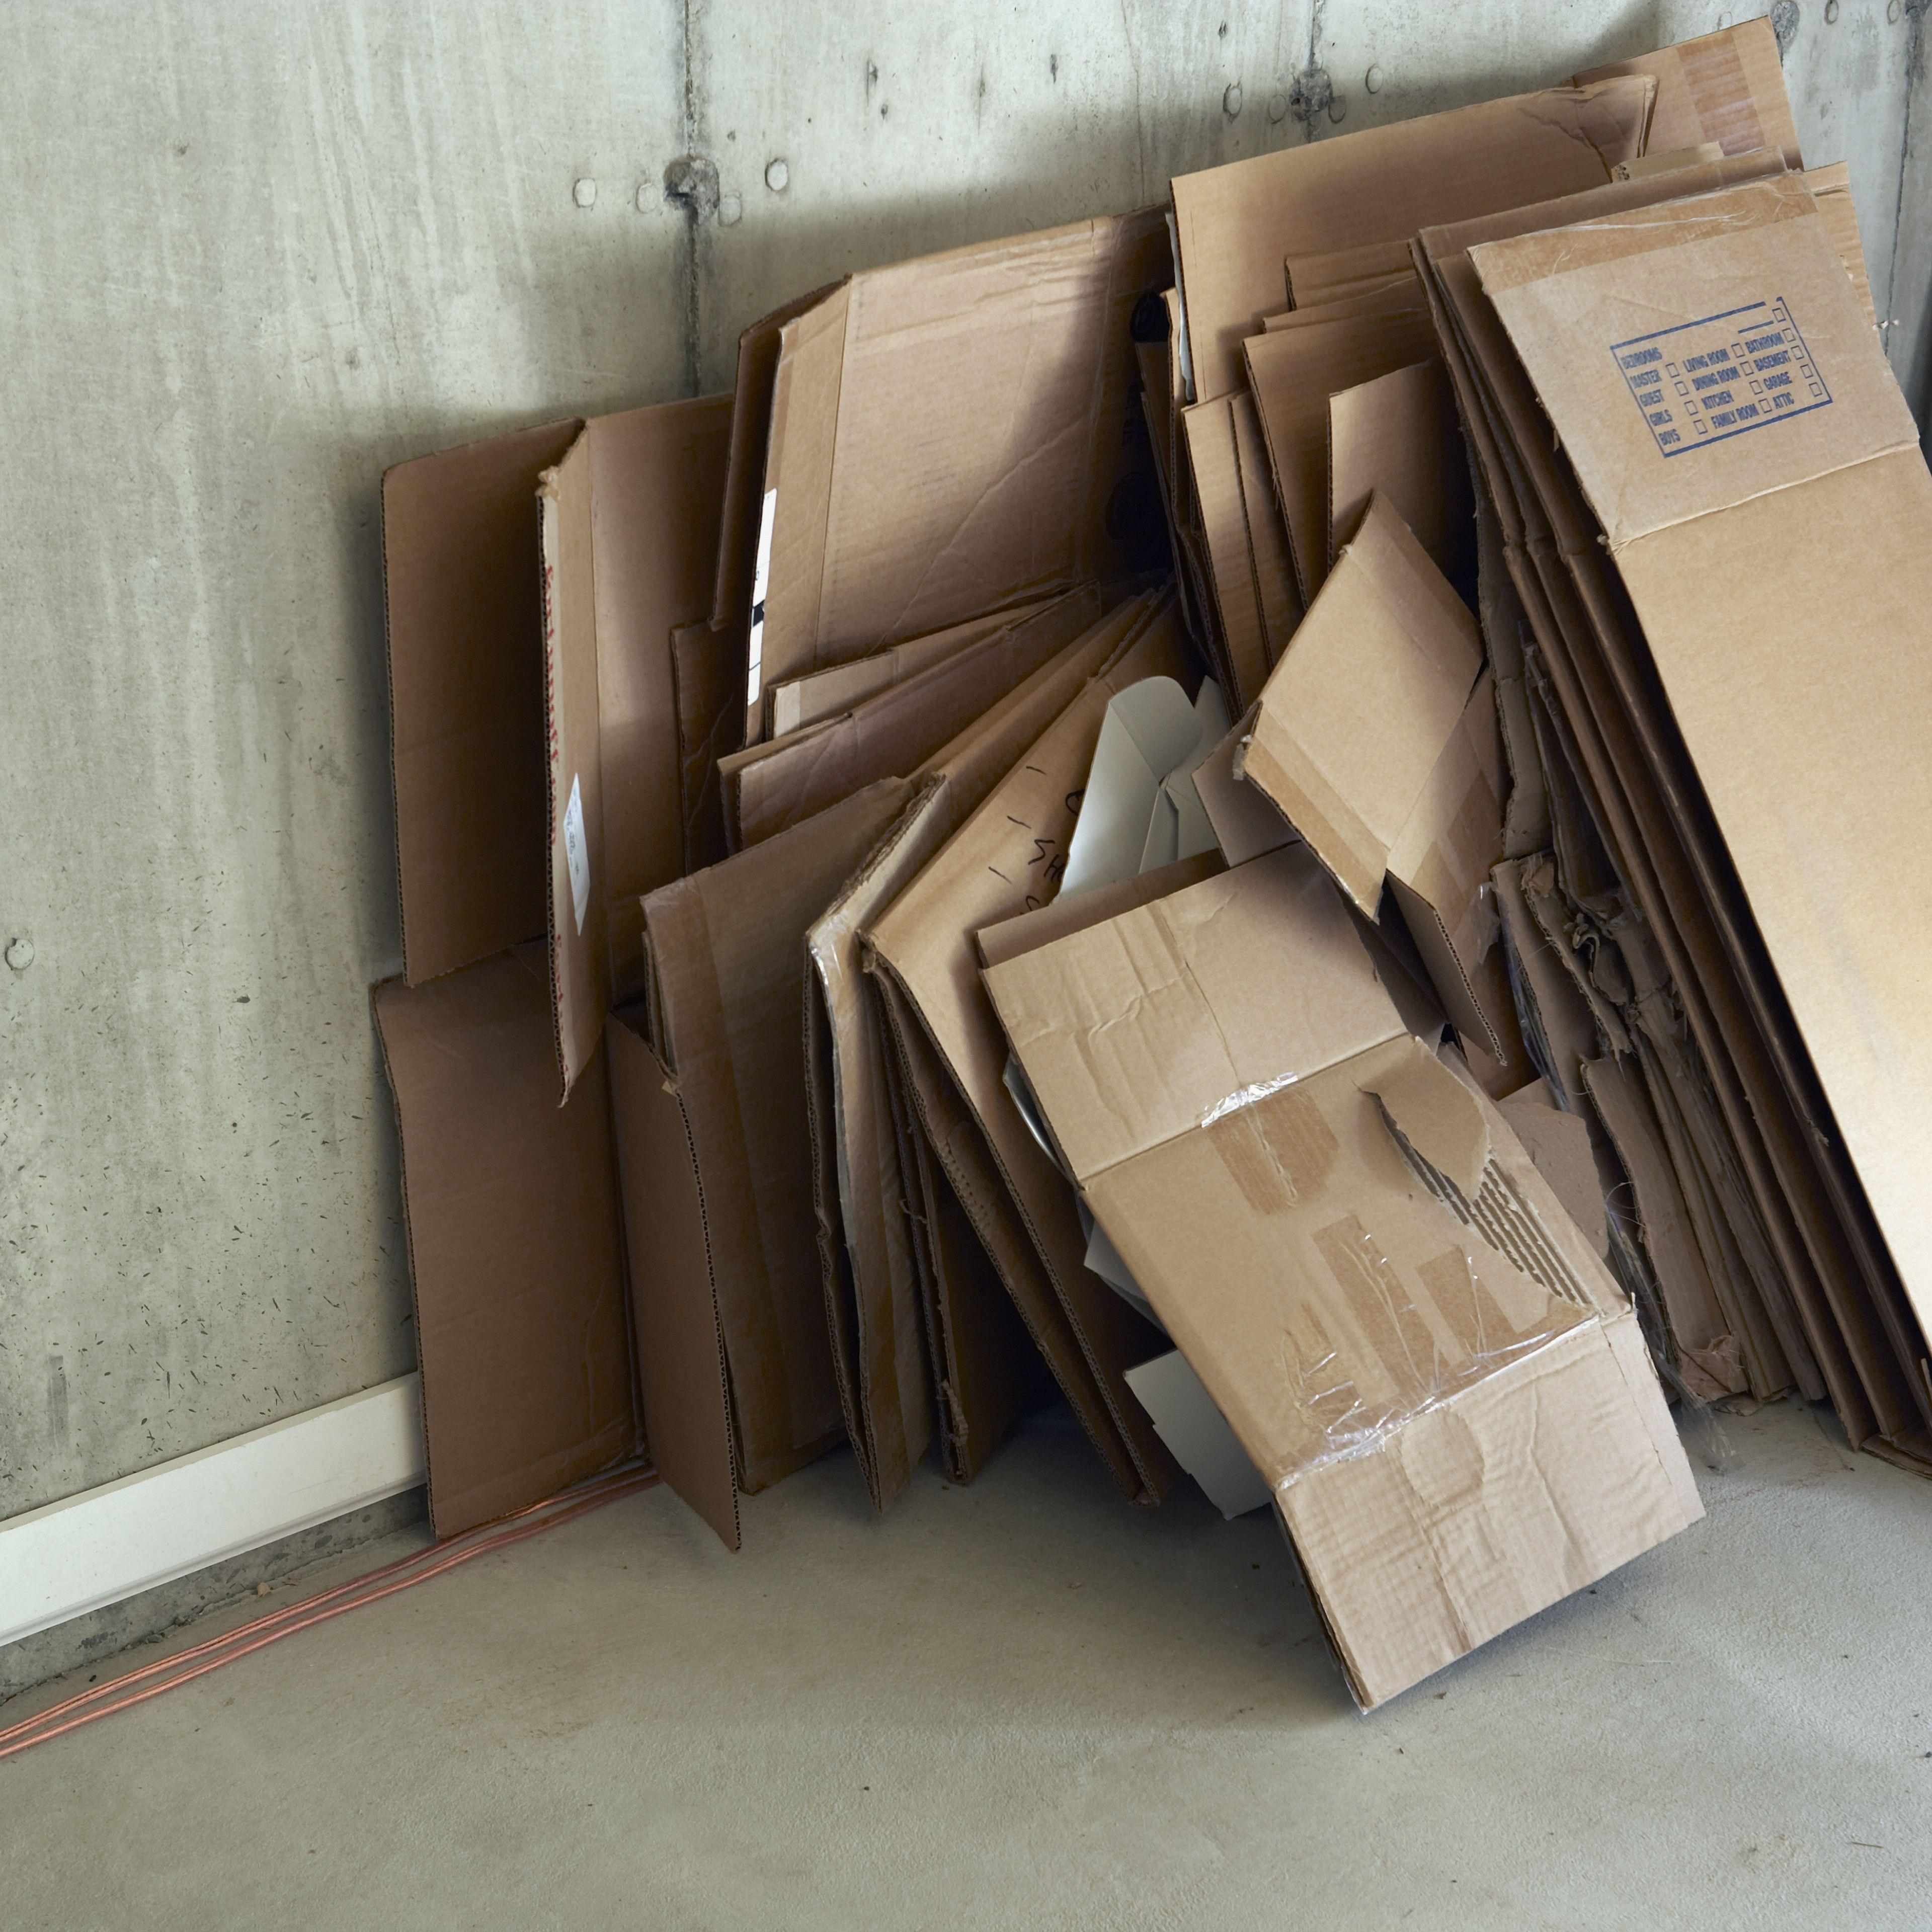 Broken Down Cardboard Boxes